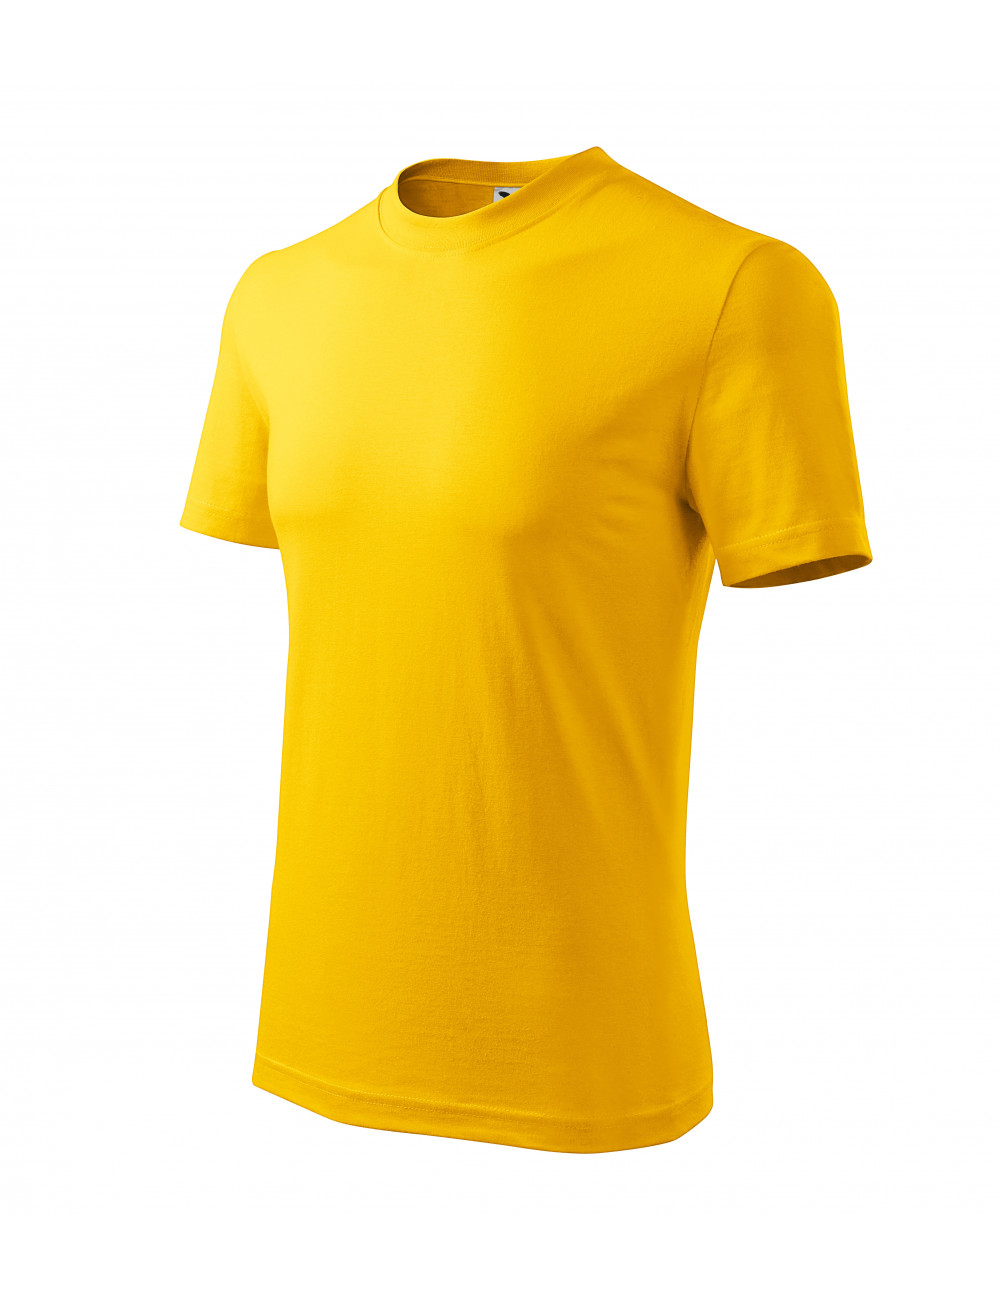 Adler MALFINI Koszulka unisex Classic 101 żółty